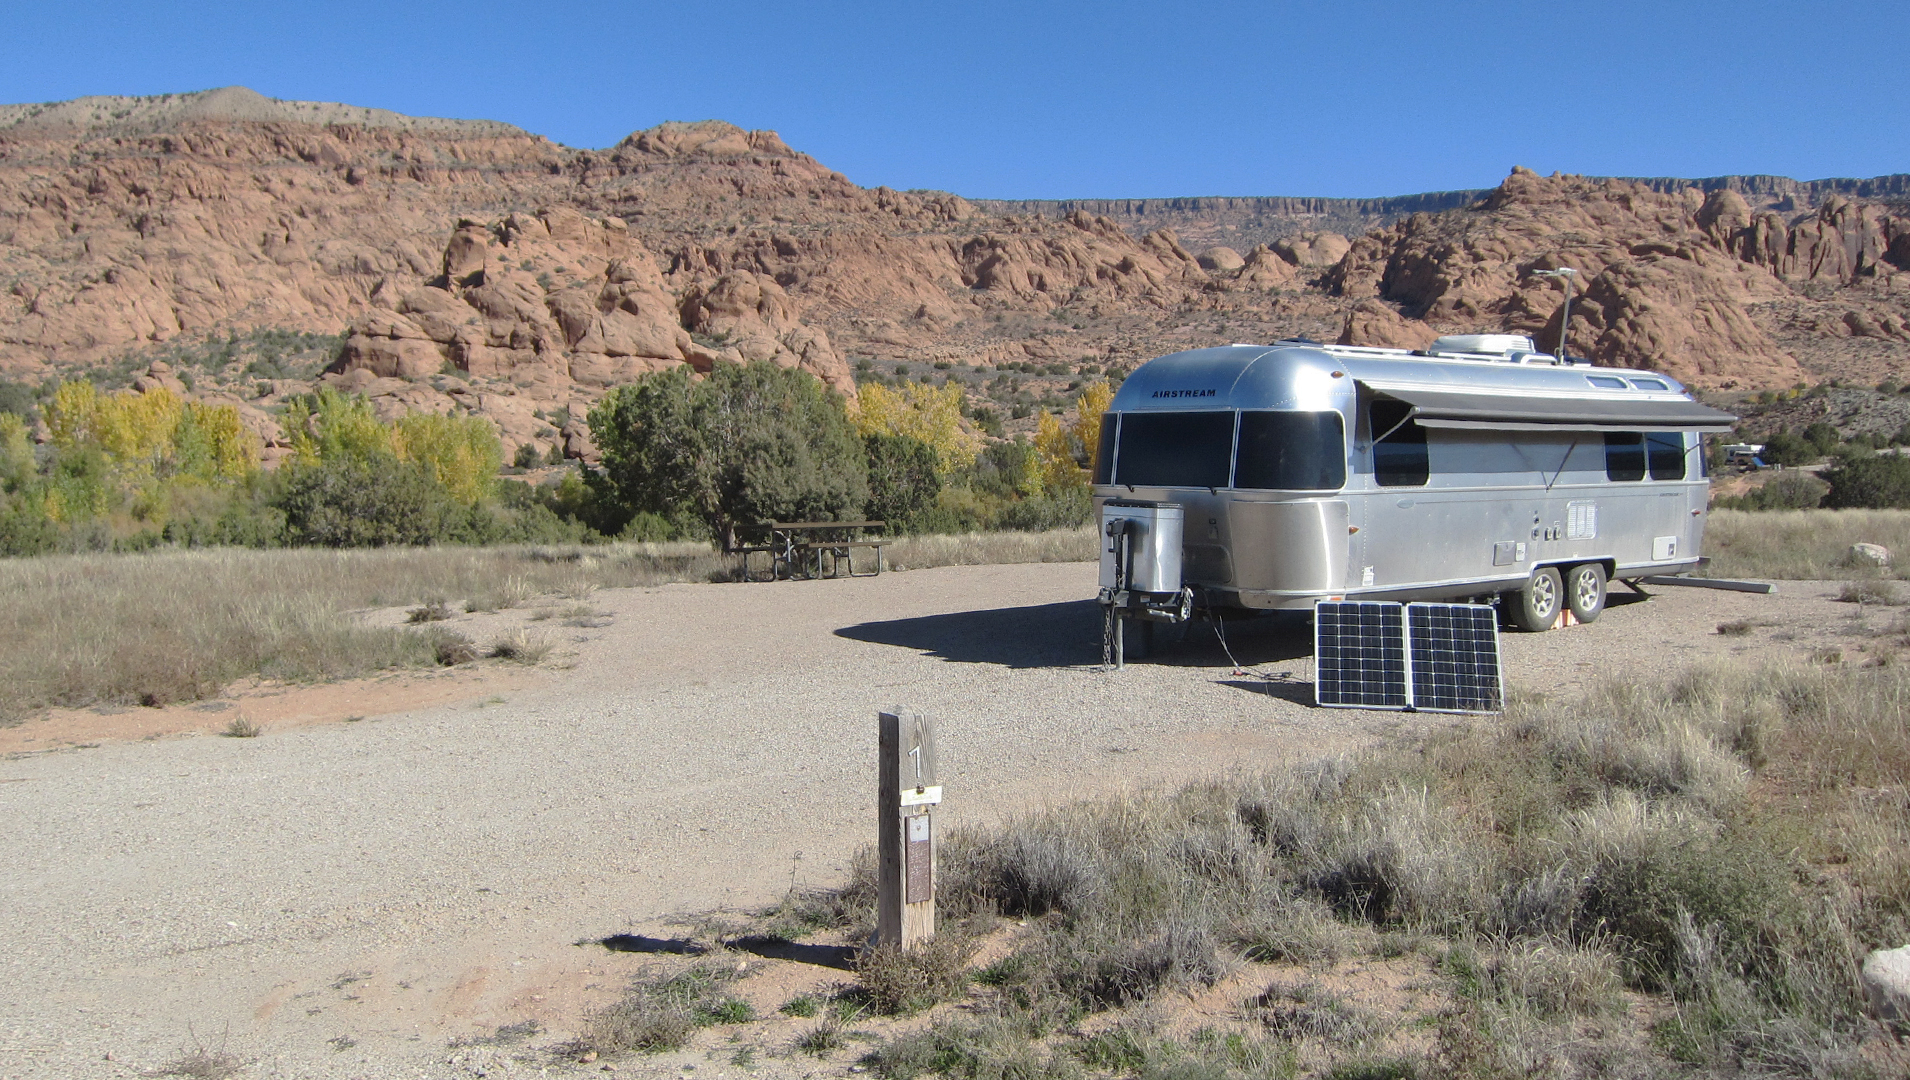 Airstream-Camping-at-Ken's-Lake-Campground-BLM